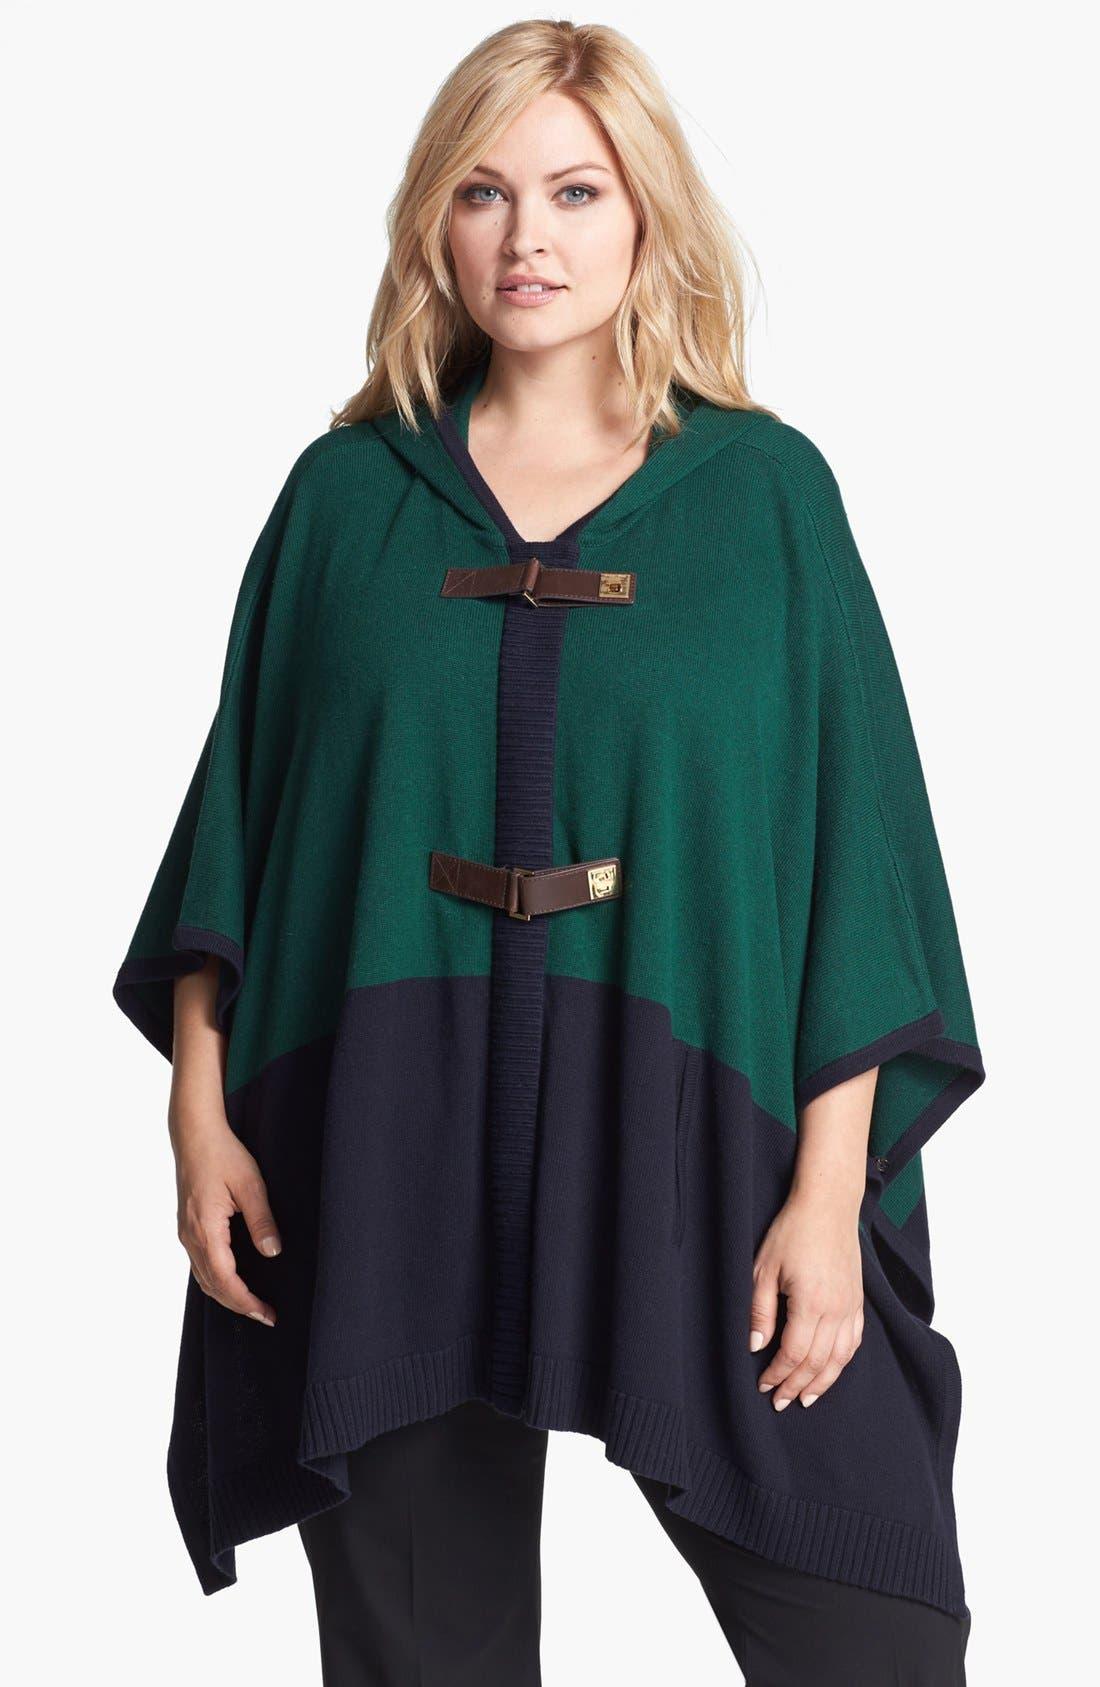 Alternate Image 1 Selected - MICHAEL Michael Kors Colorblock Poncho Sweater (Plus Size)